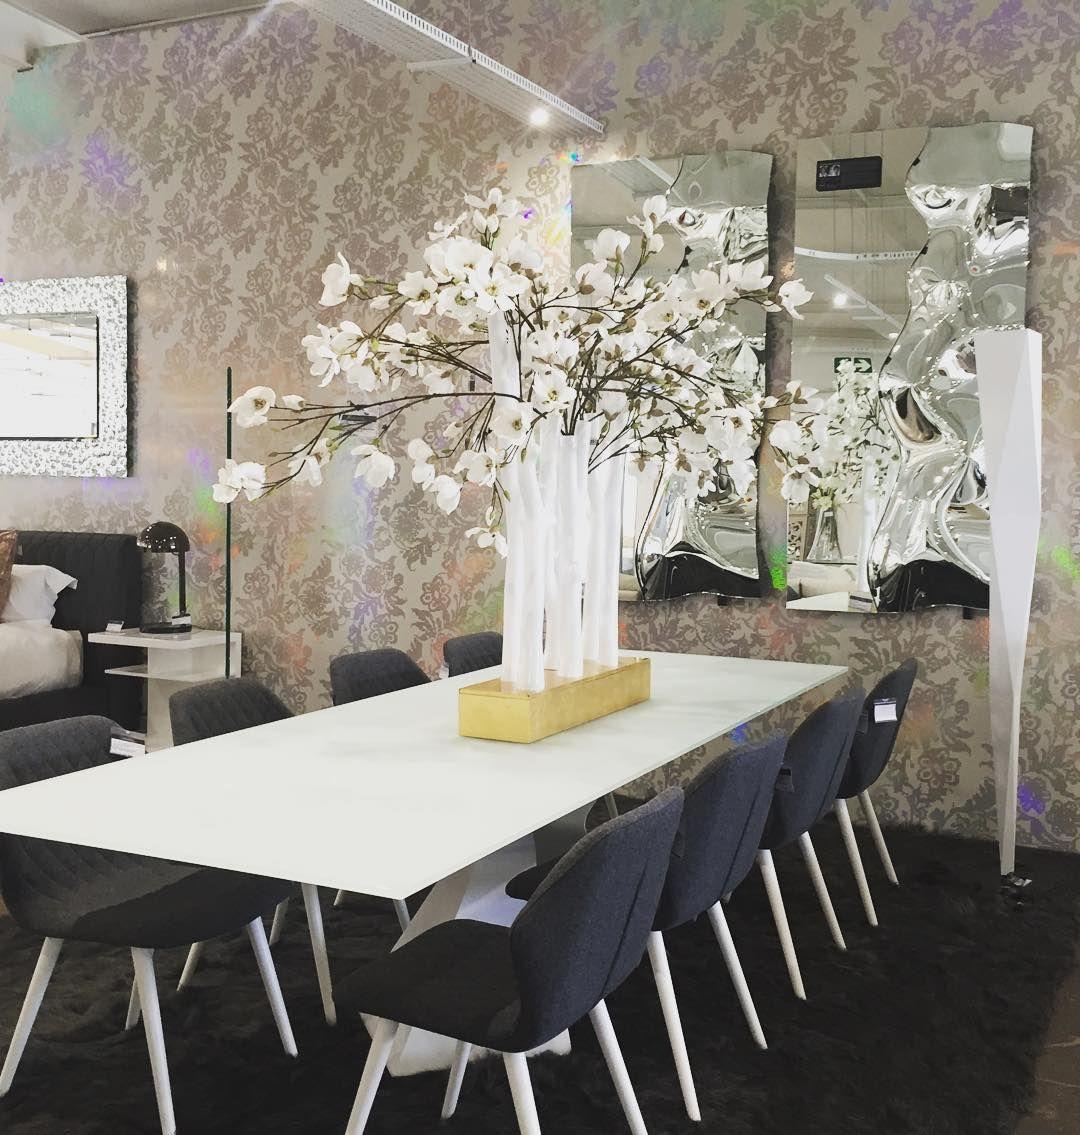 Casarredo casarredosa kramerville furniture italian italian design decor bonaldo bross fiam fontanaarte